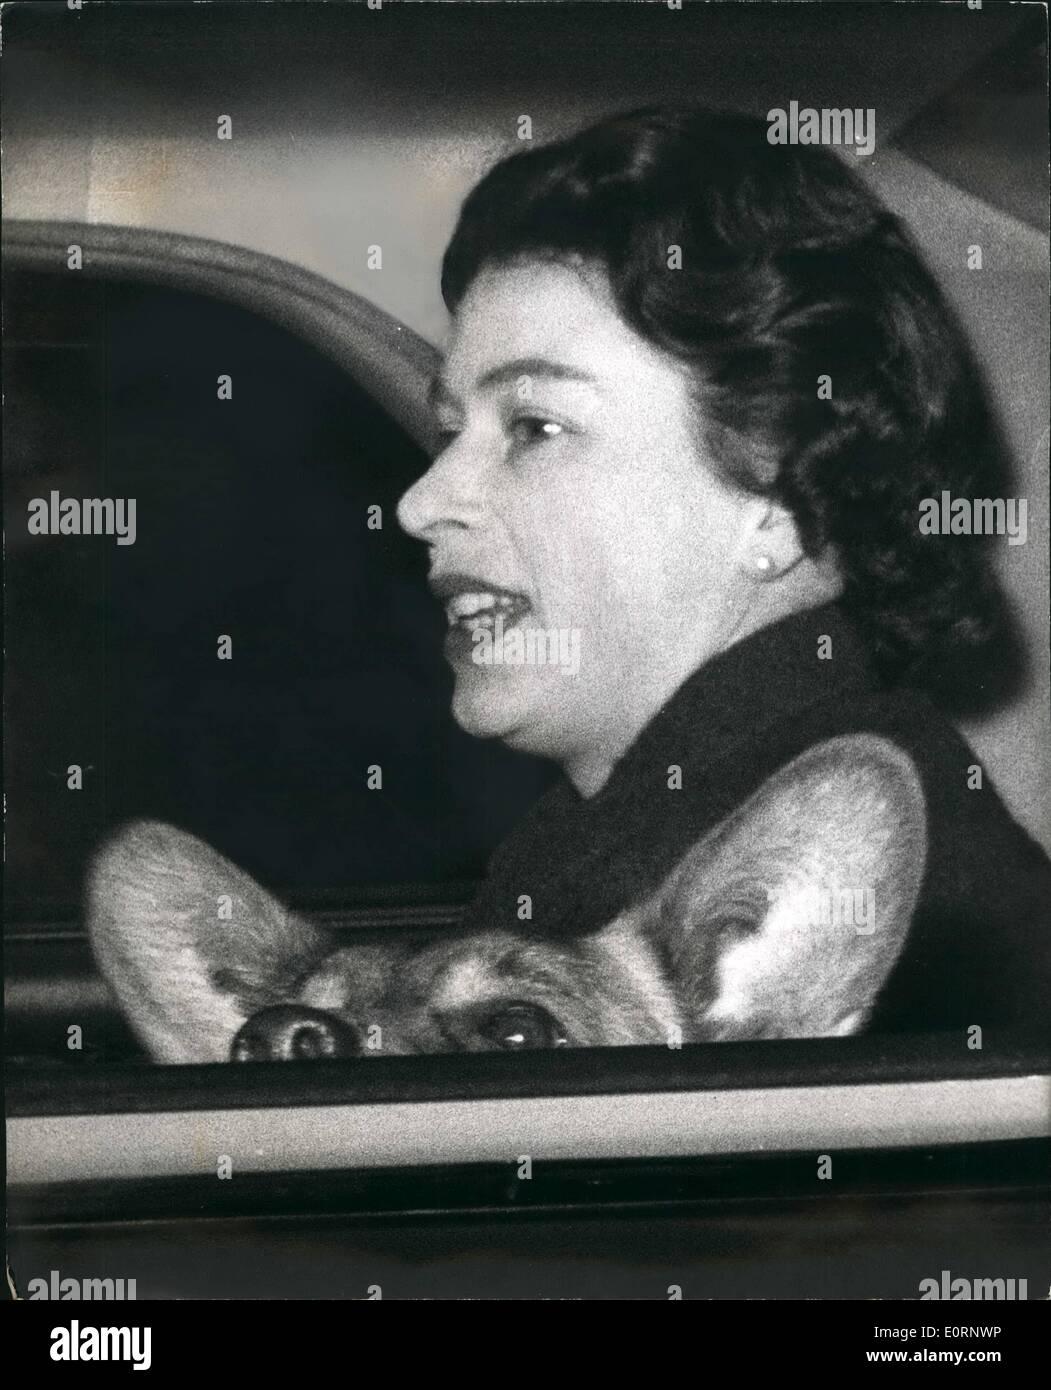 feb-02-1960-queen-goes-for-car-ride-with-her-pet-corgi-keystone-photo-E0RNWP.jpg